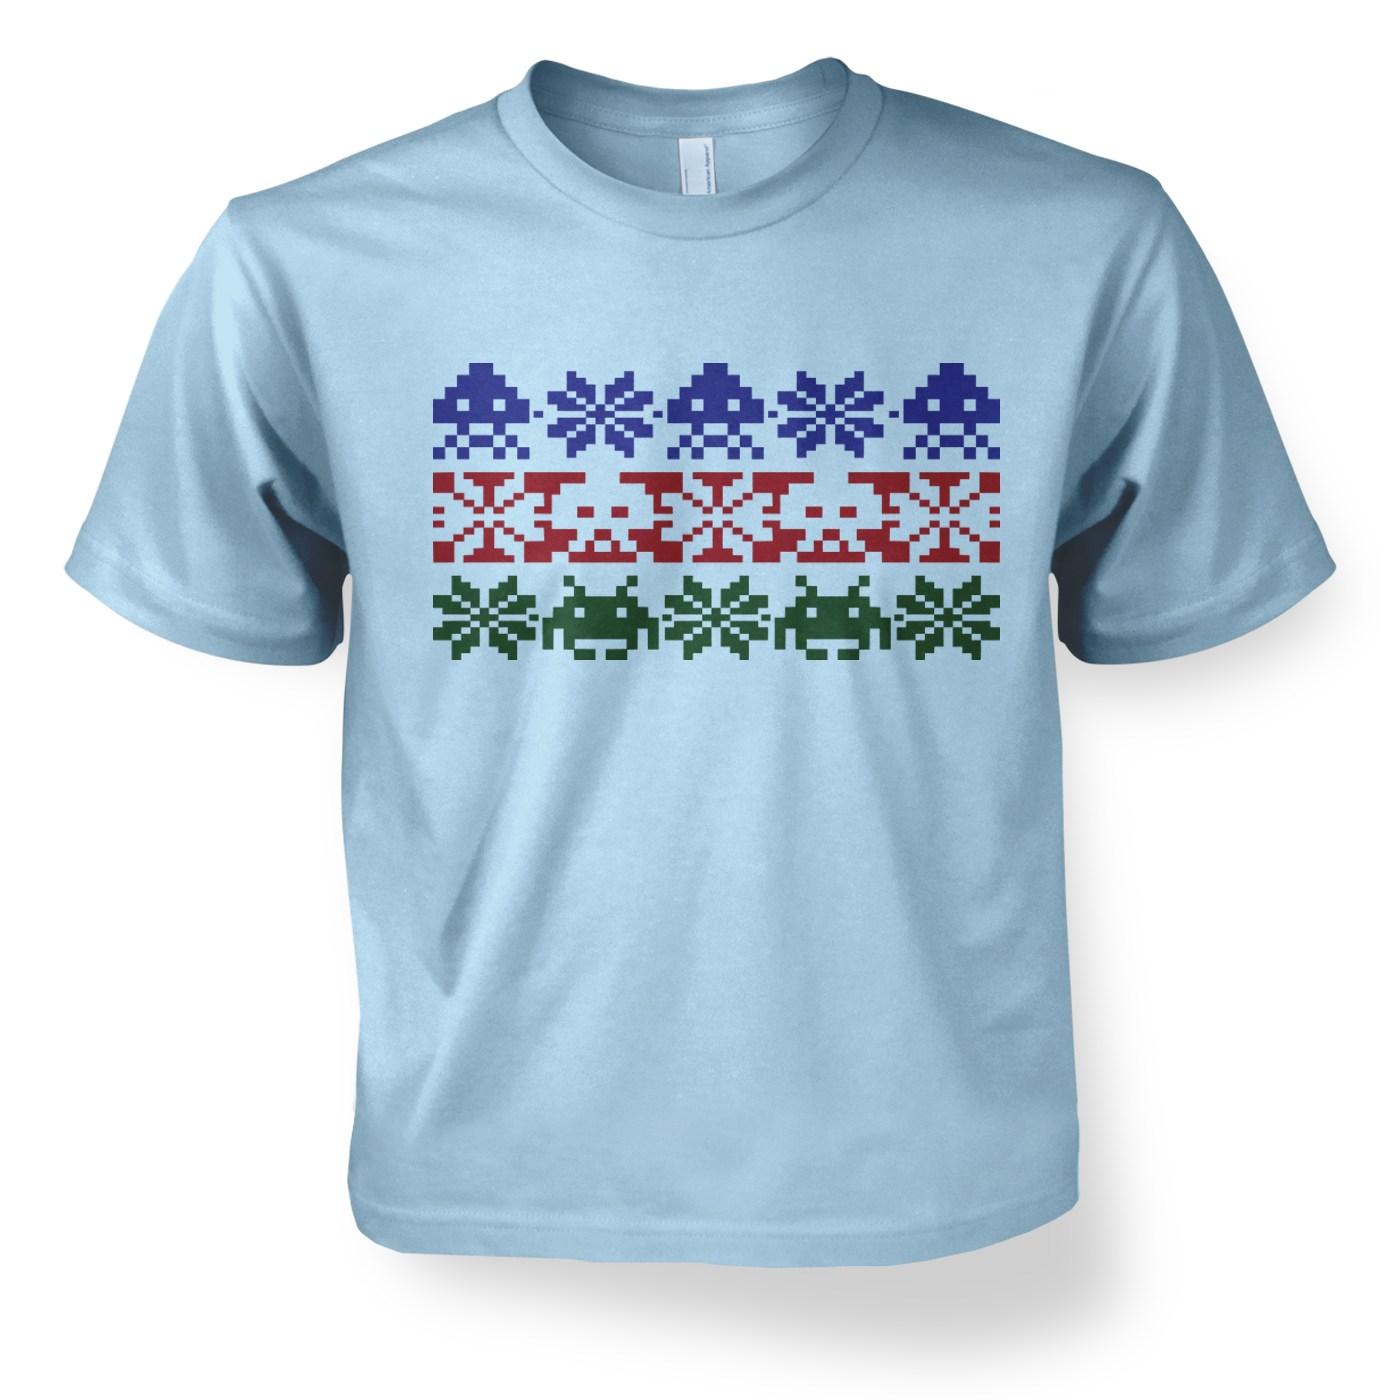 Isle Invaders kids' t-shirt